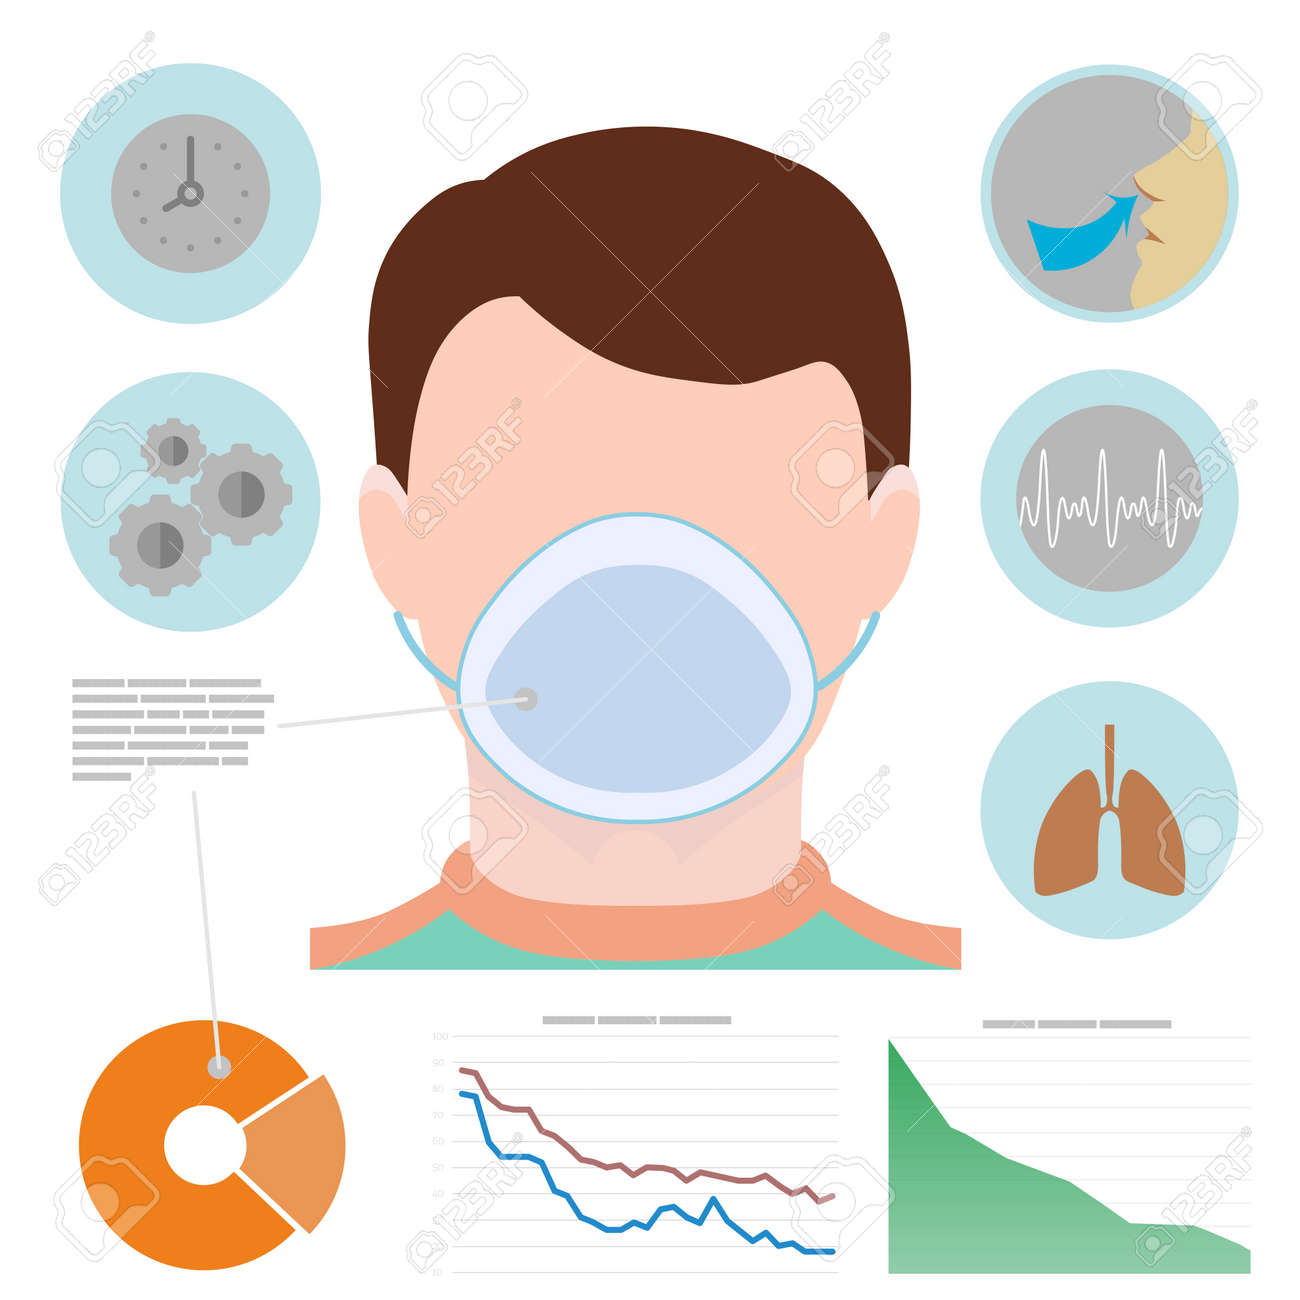 Respiratory infographic man in respiratory mask icons with respiratory infographic man in respiratory mask icons with lungs easy breathing clock ccuart Gallery